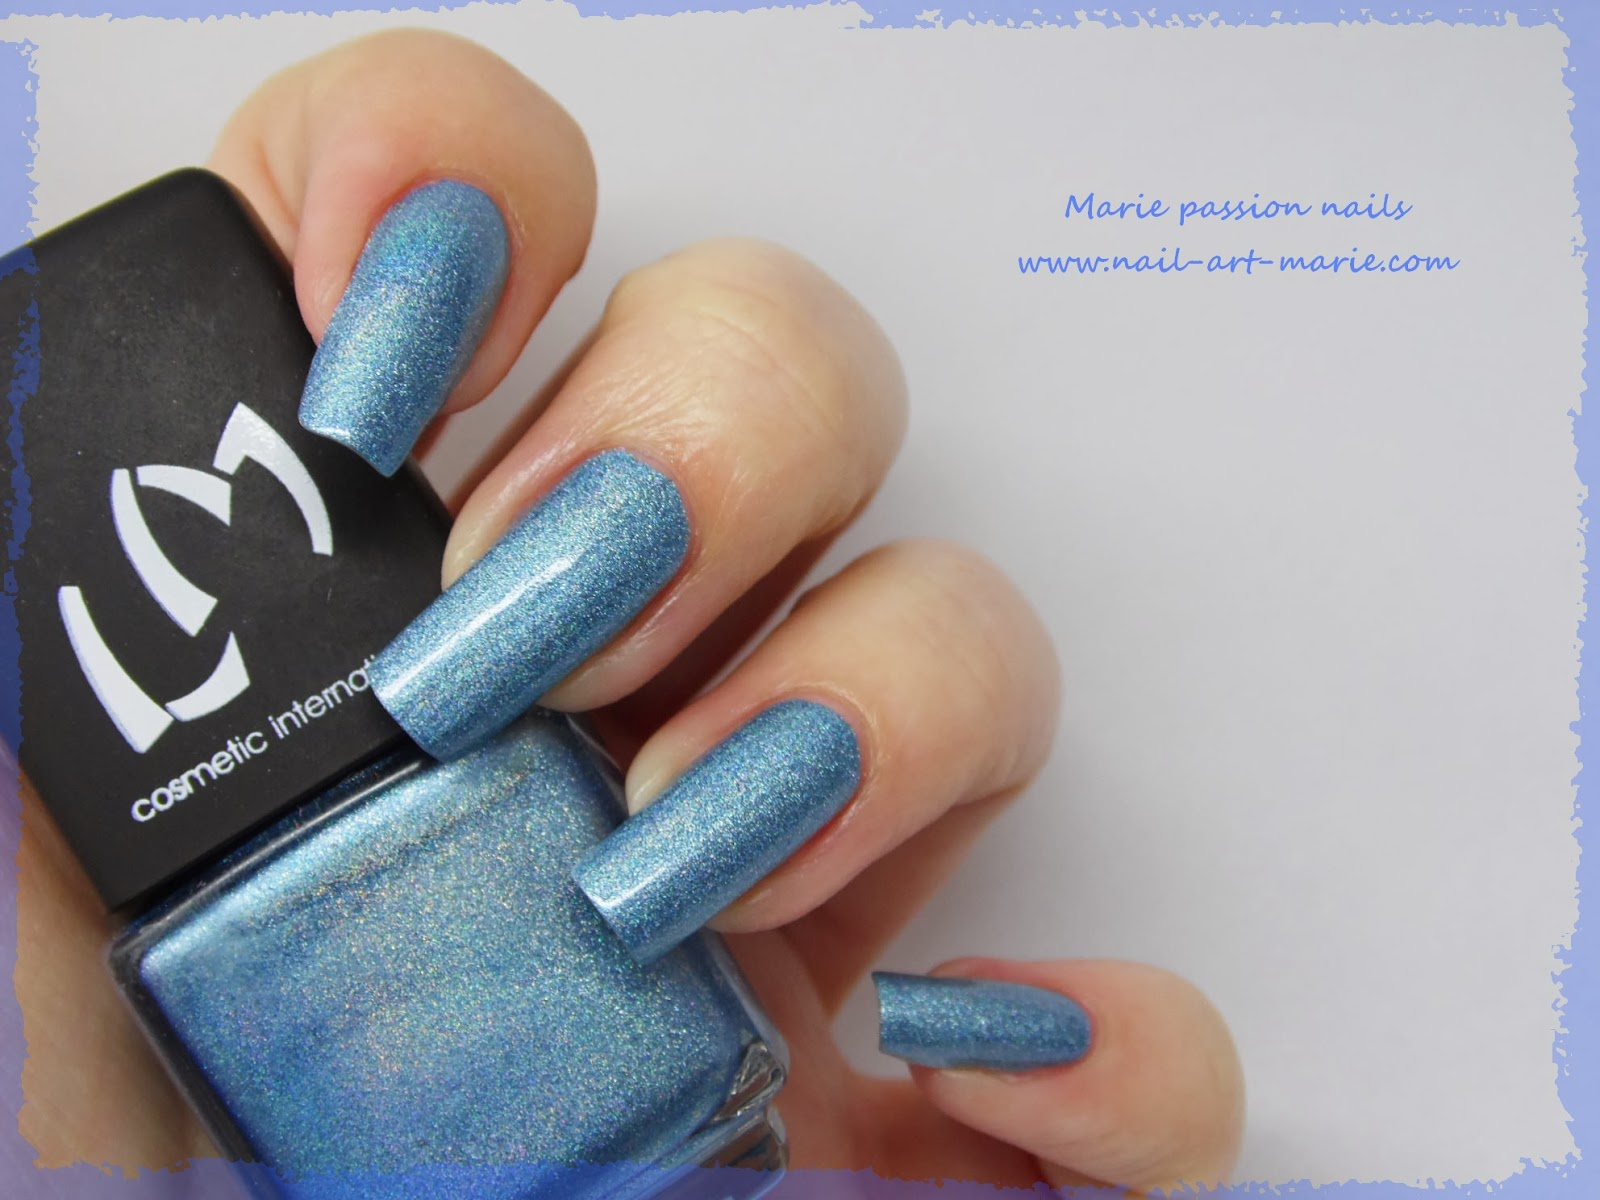 LM Cosmetic Nunki8